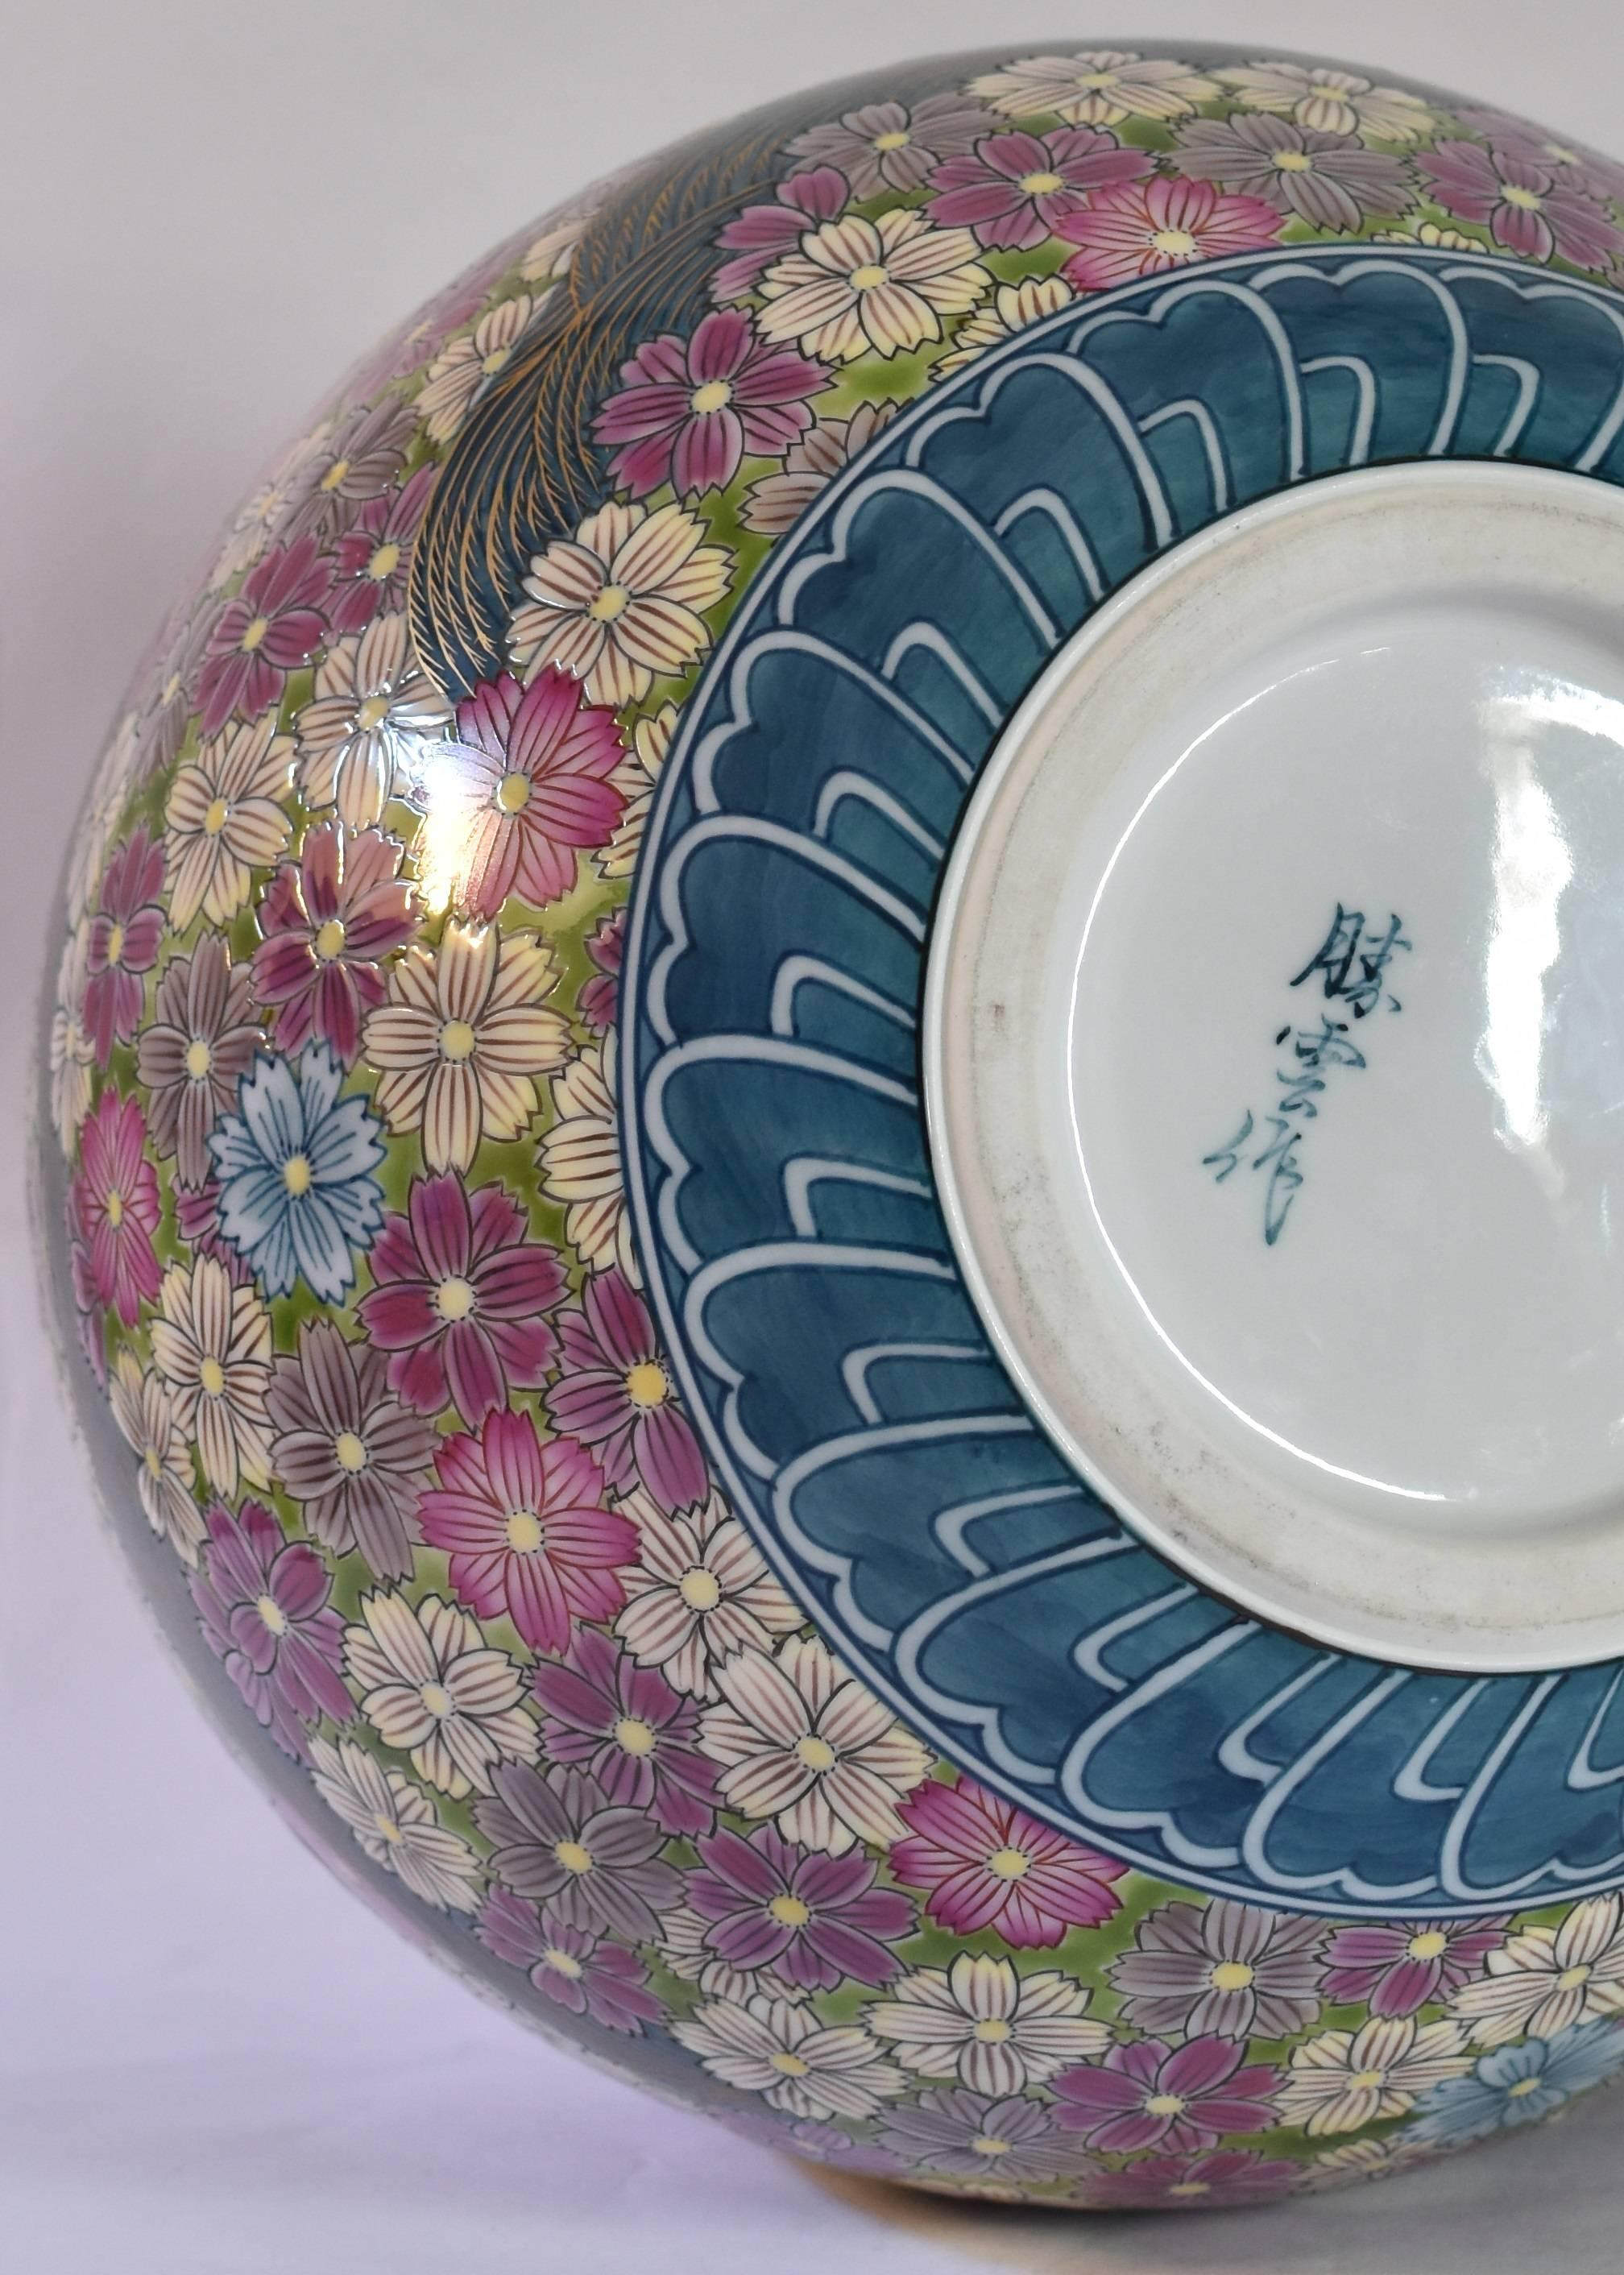 Contemporary Japanese Imari Porcelain Vase by Fujii Katsuma For Sale 3 & Contemporary Japanese Imari Porcelain Vase by Fujii Katsuma For Sale ...